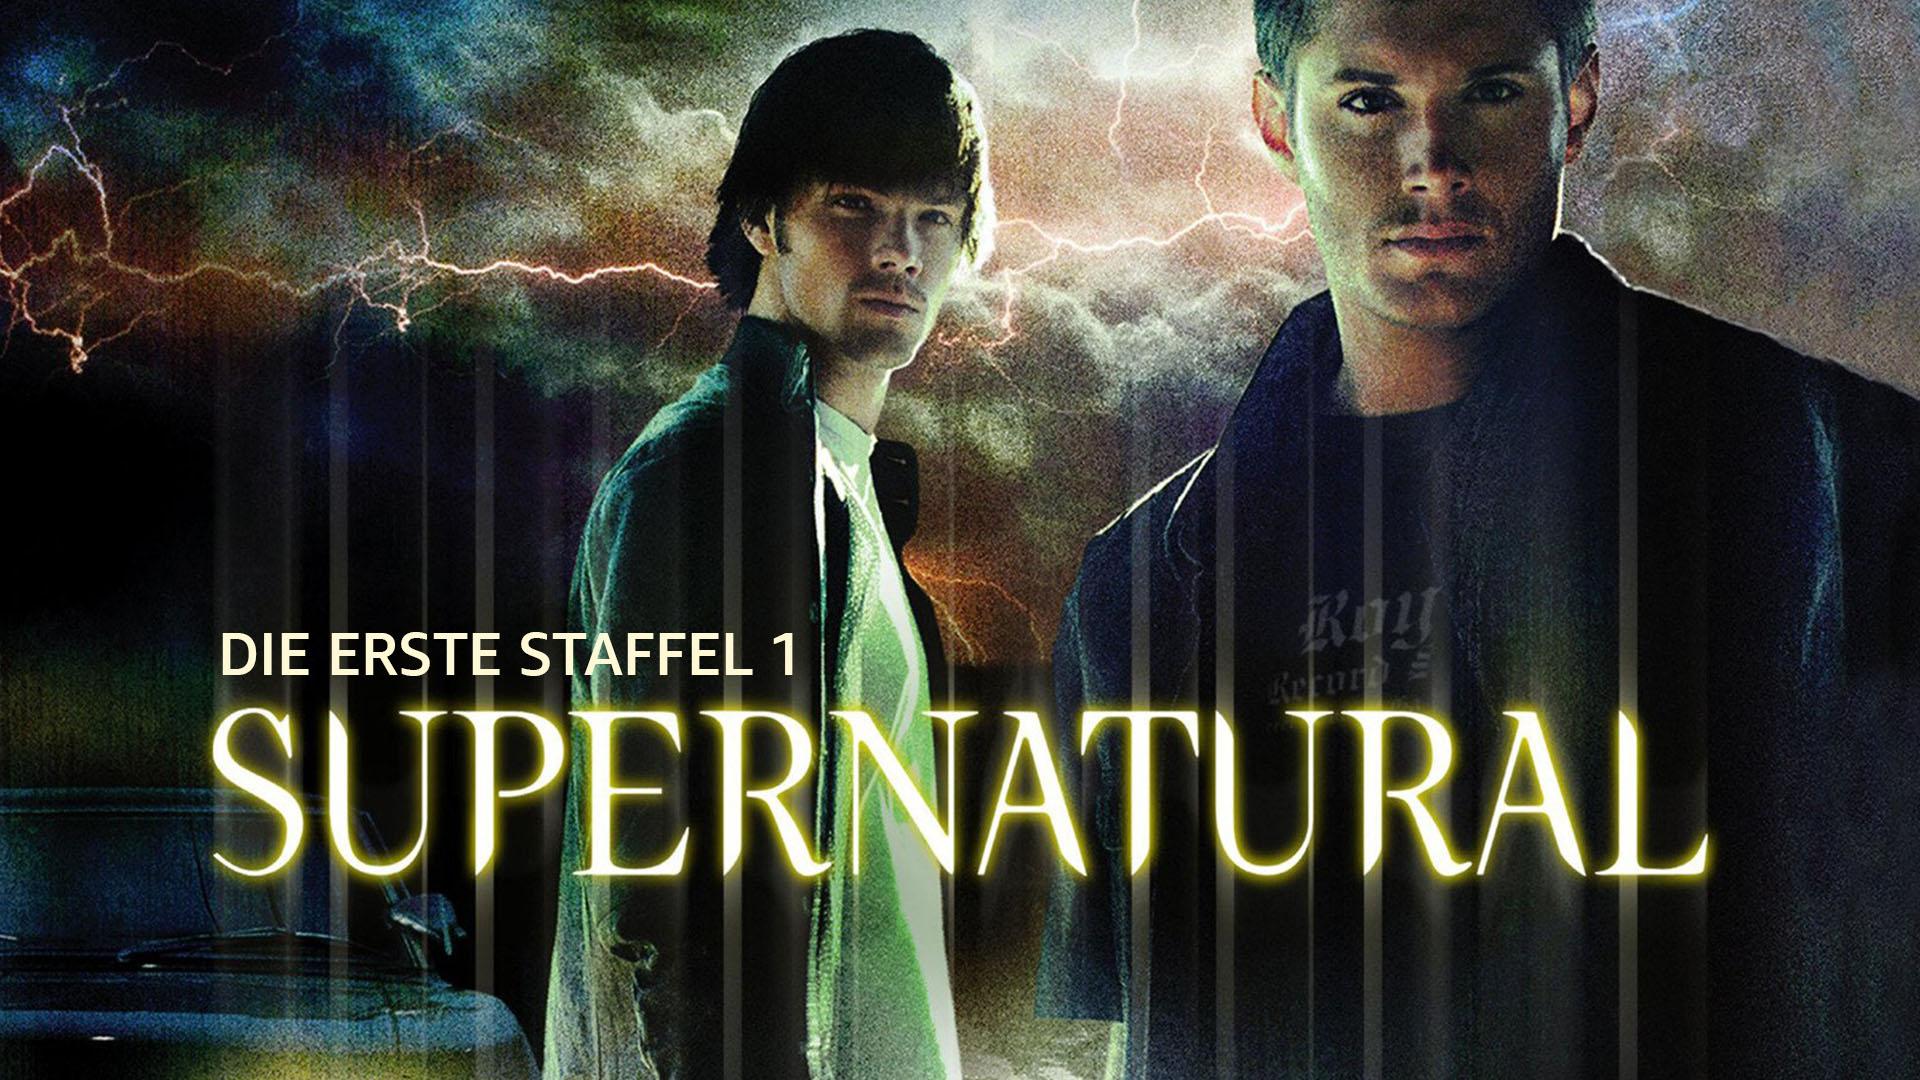 Supernatural - Staffel 1 [dt./OV]